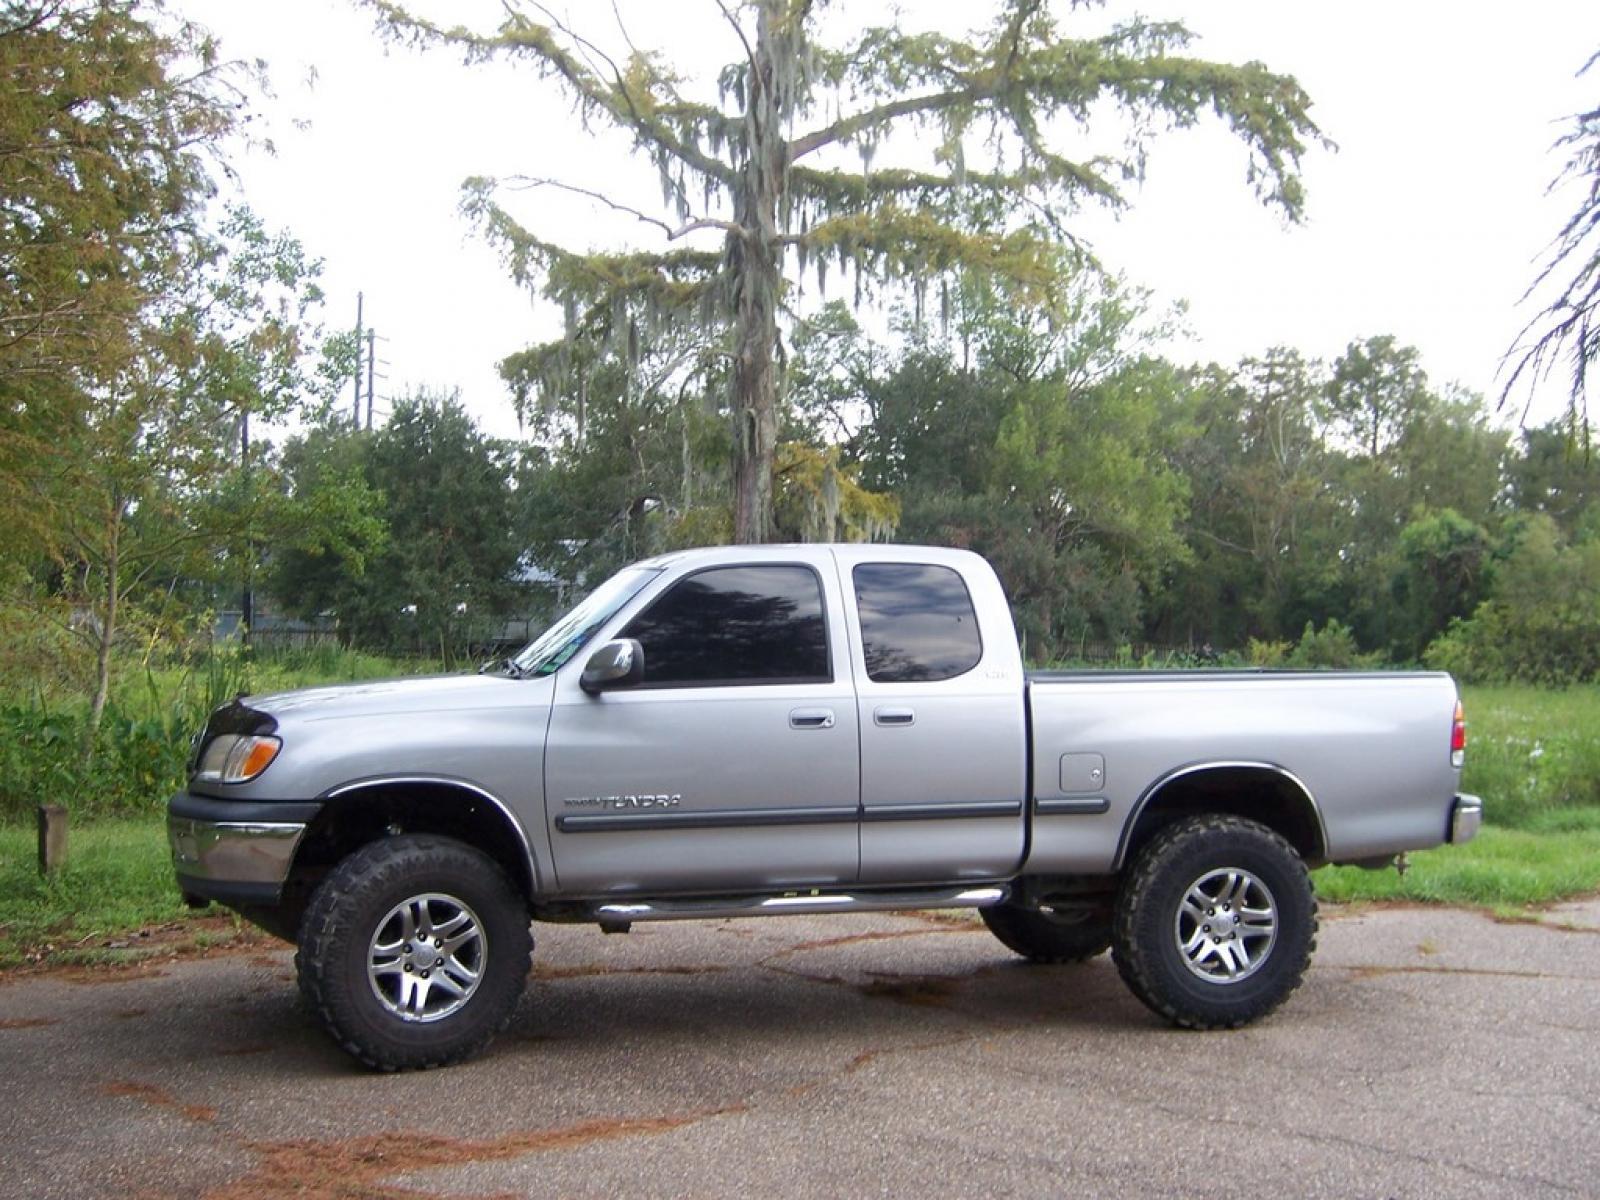 2001 Toyota Tundra Information And Photos Zombiedrive 2004 Fuse Box Diagram 800 1024 1280 1600 Origin